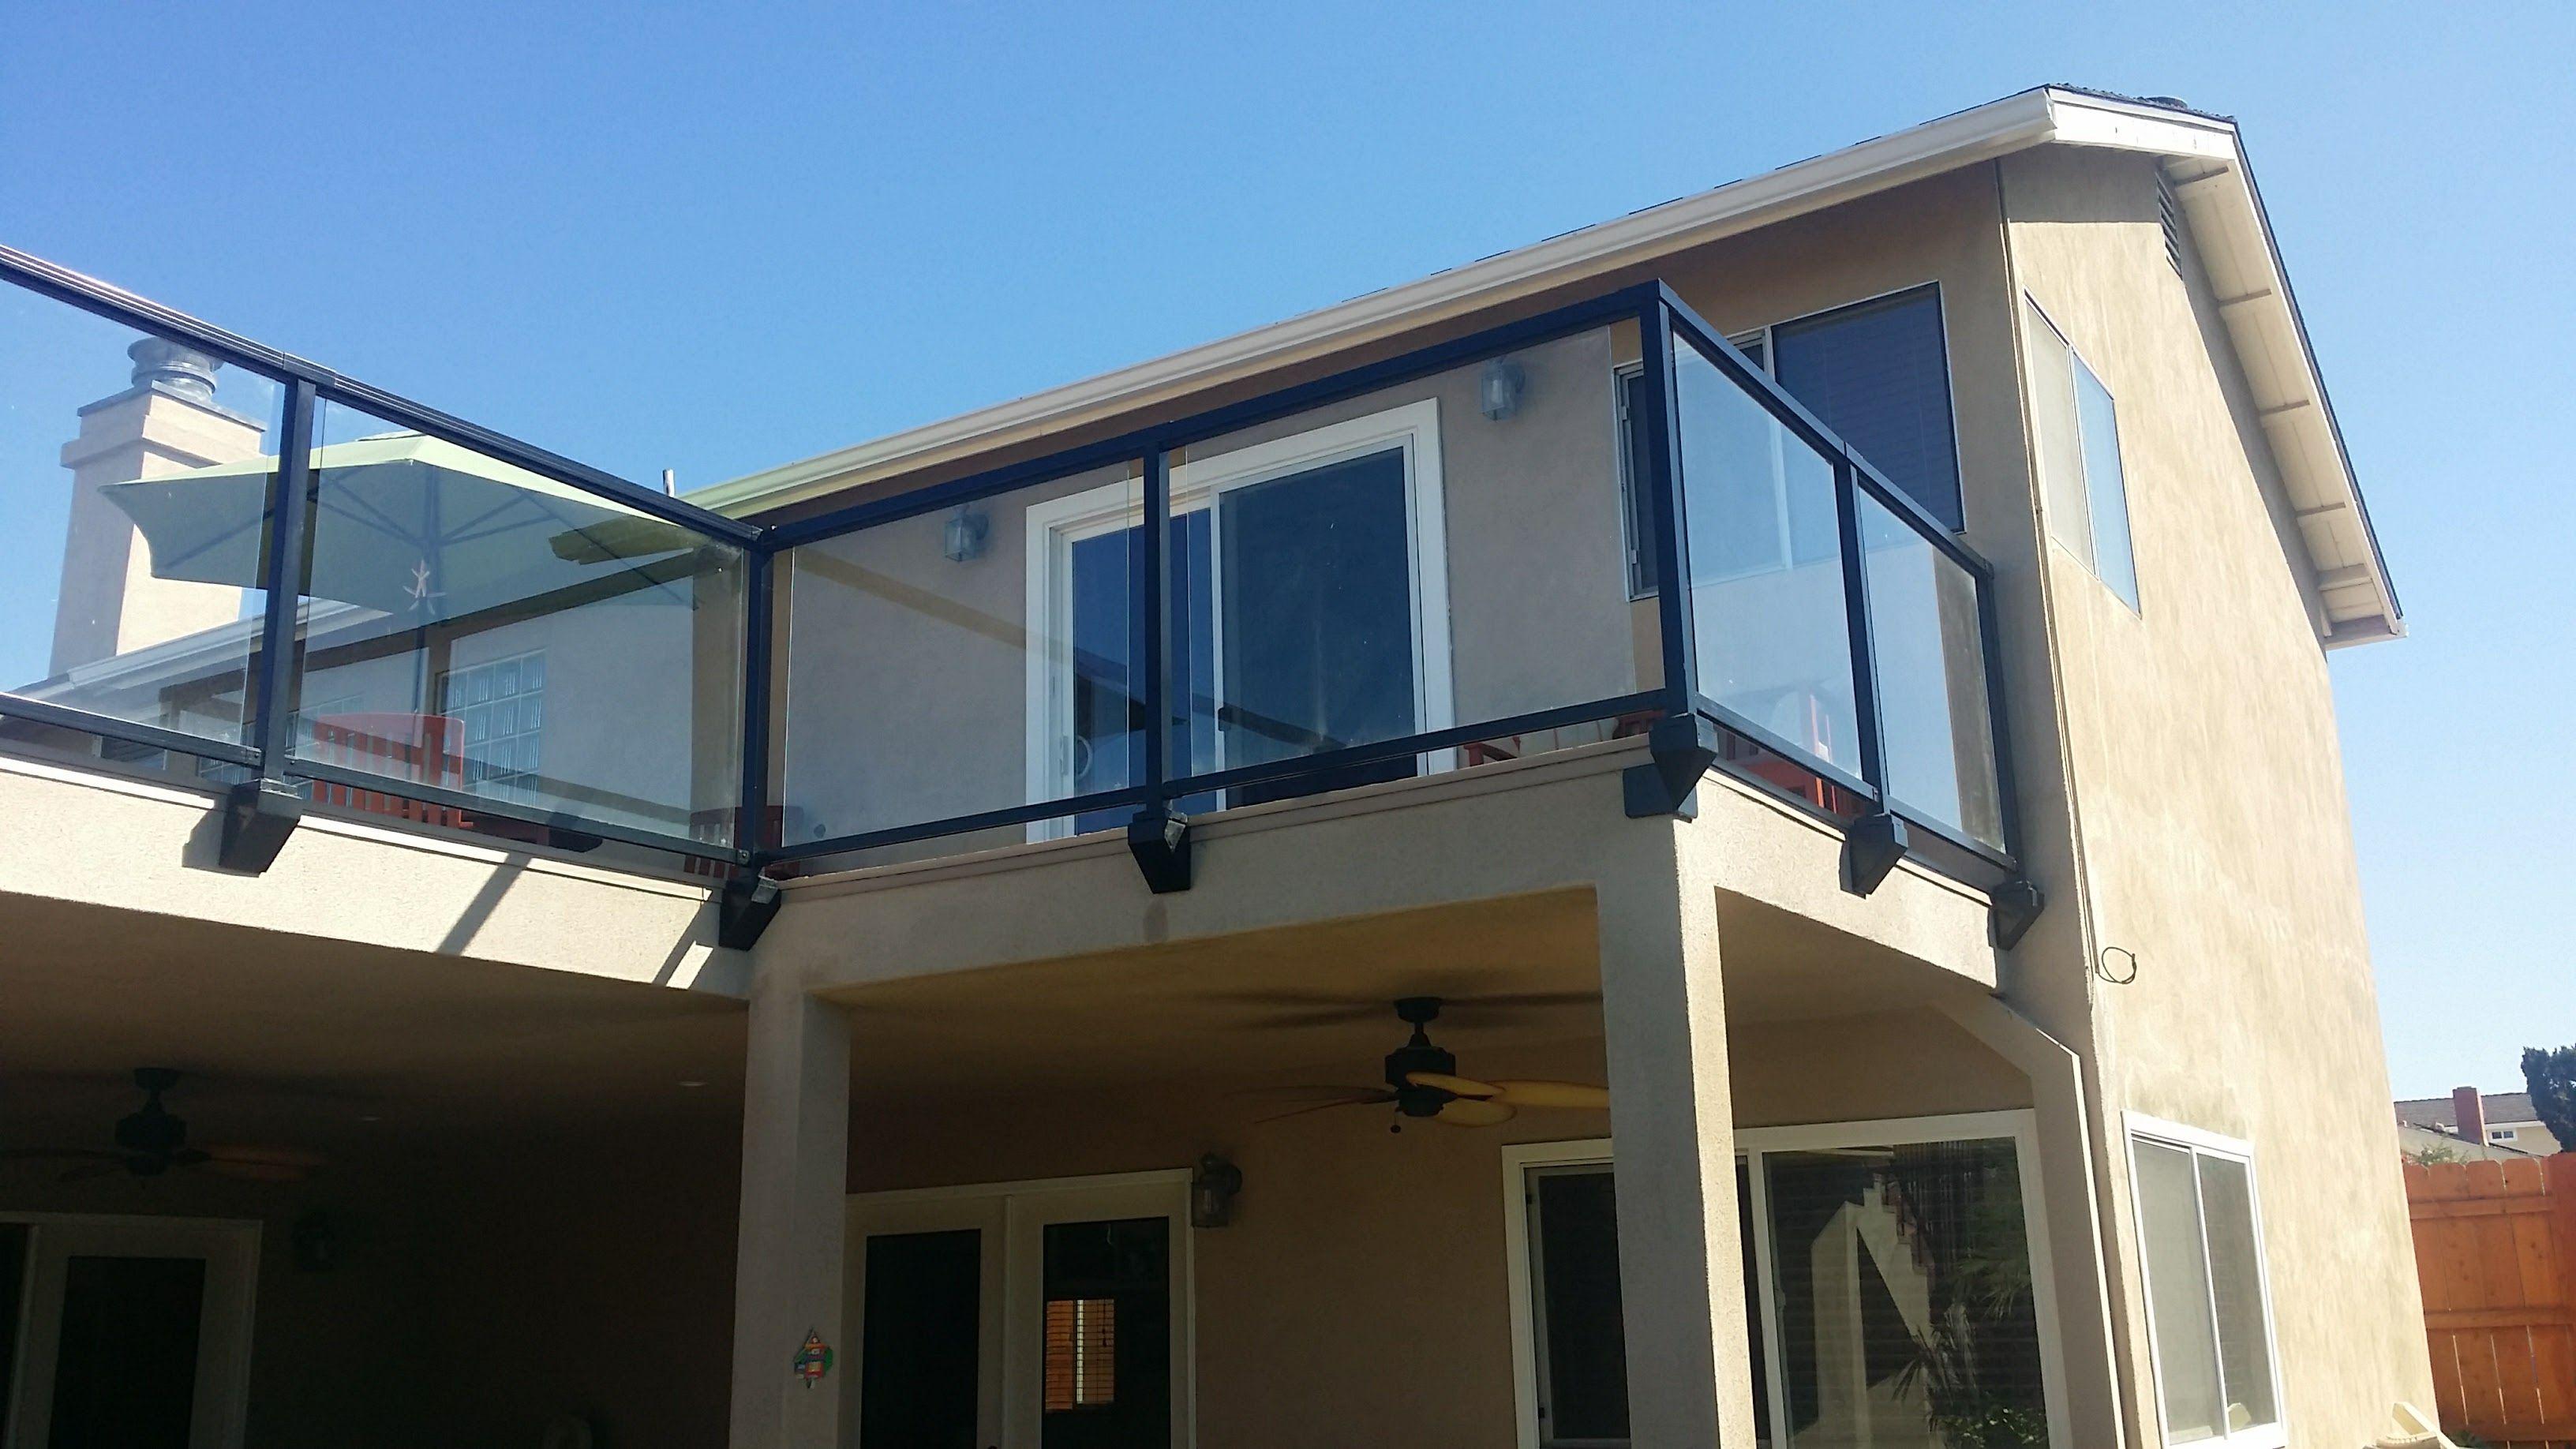 Facia Deck Railing Glass | Deck railings, Home depot ...